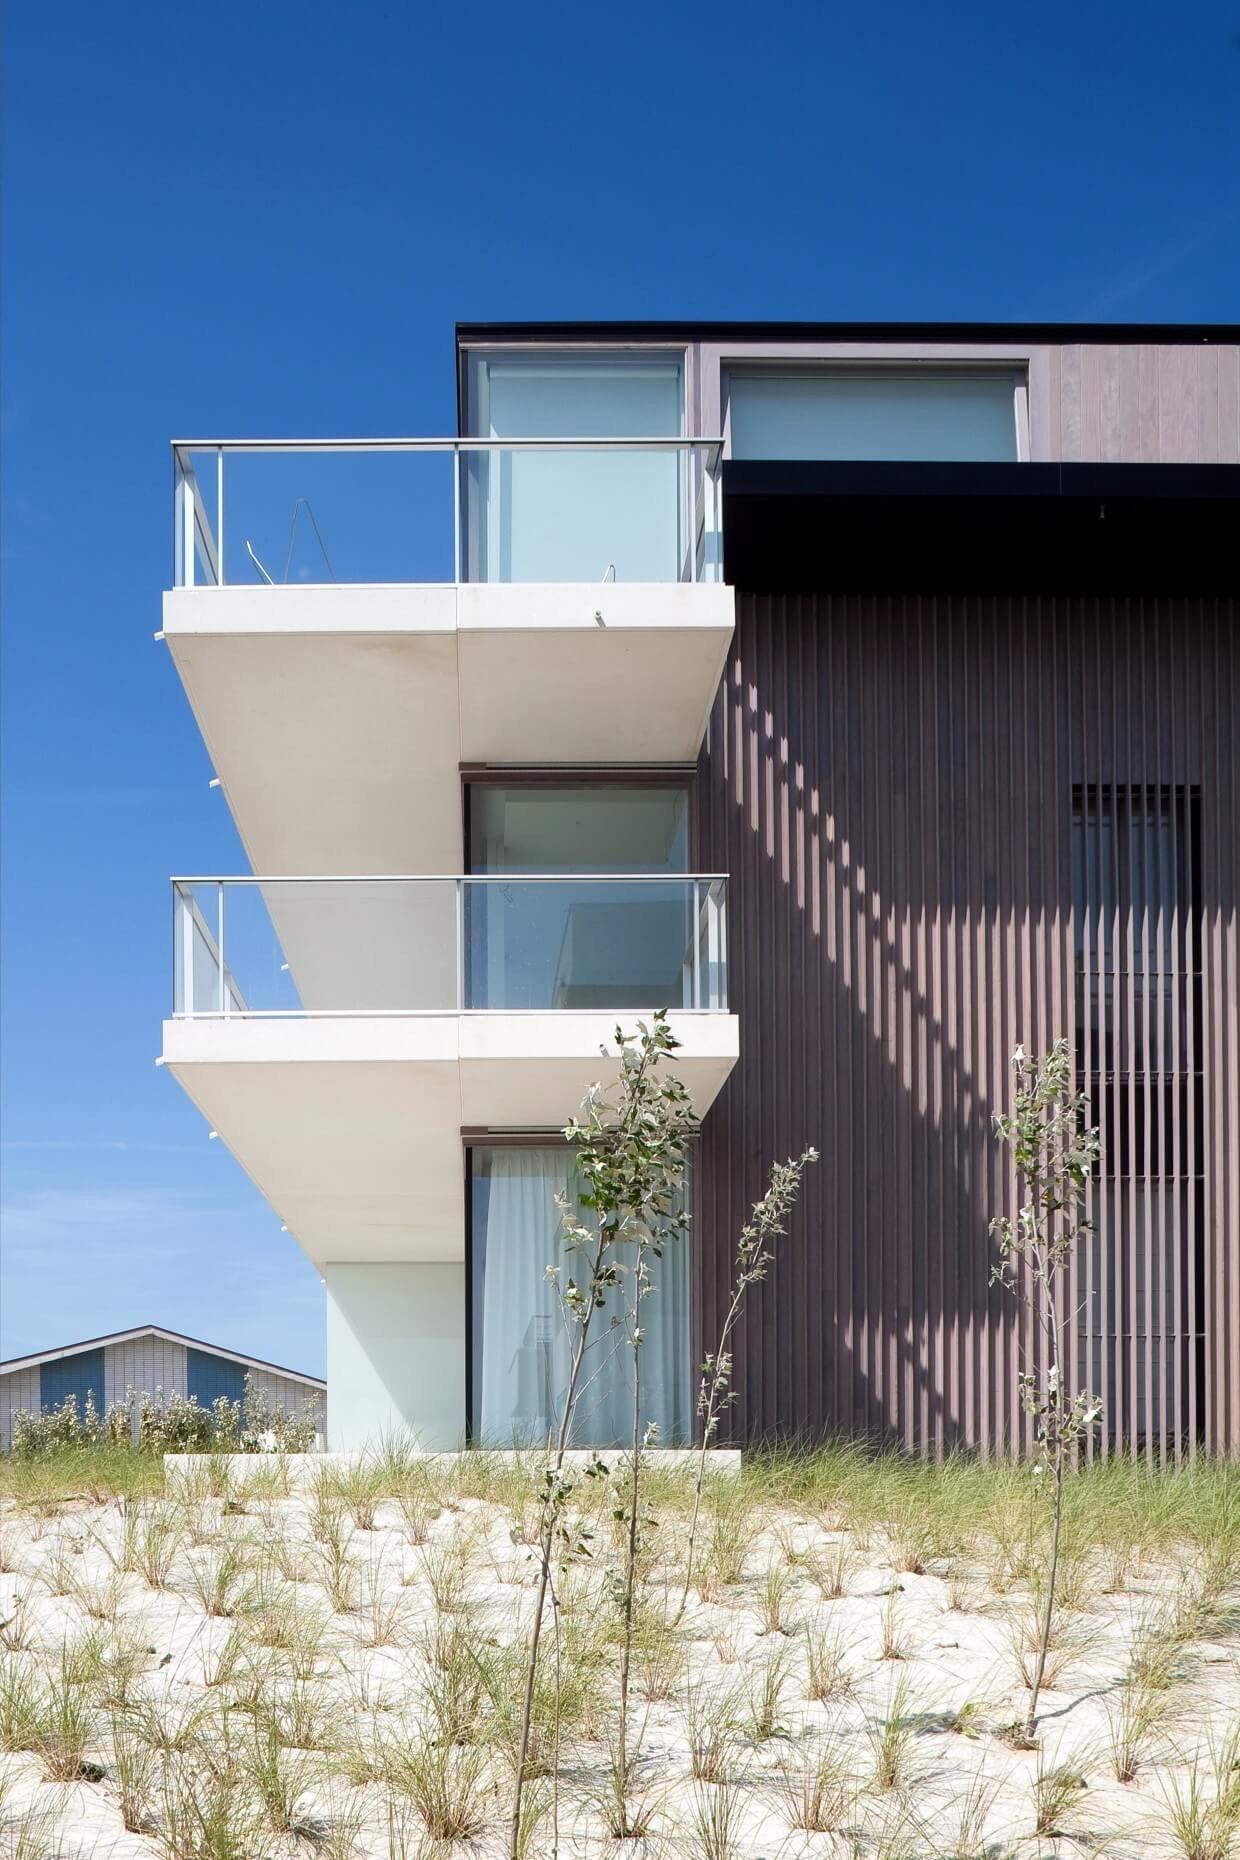 Rietveldprojects-Periscoop-appartement-design-architectuur-kust12